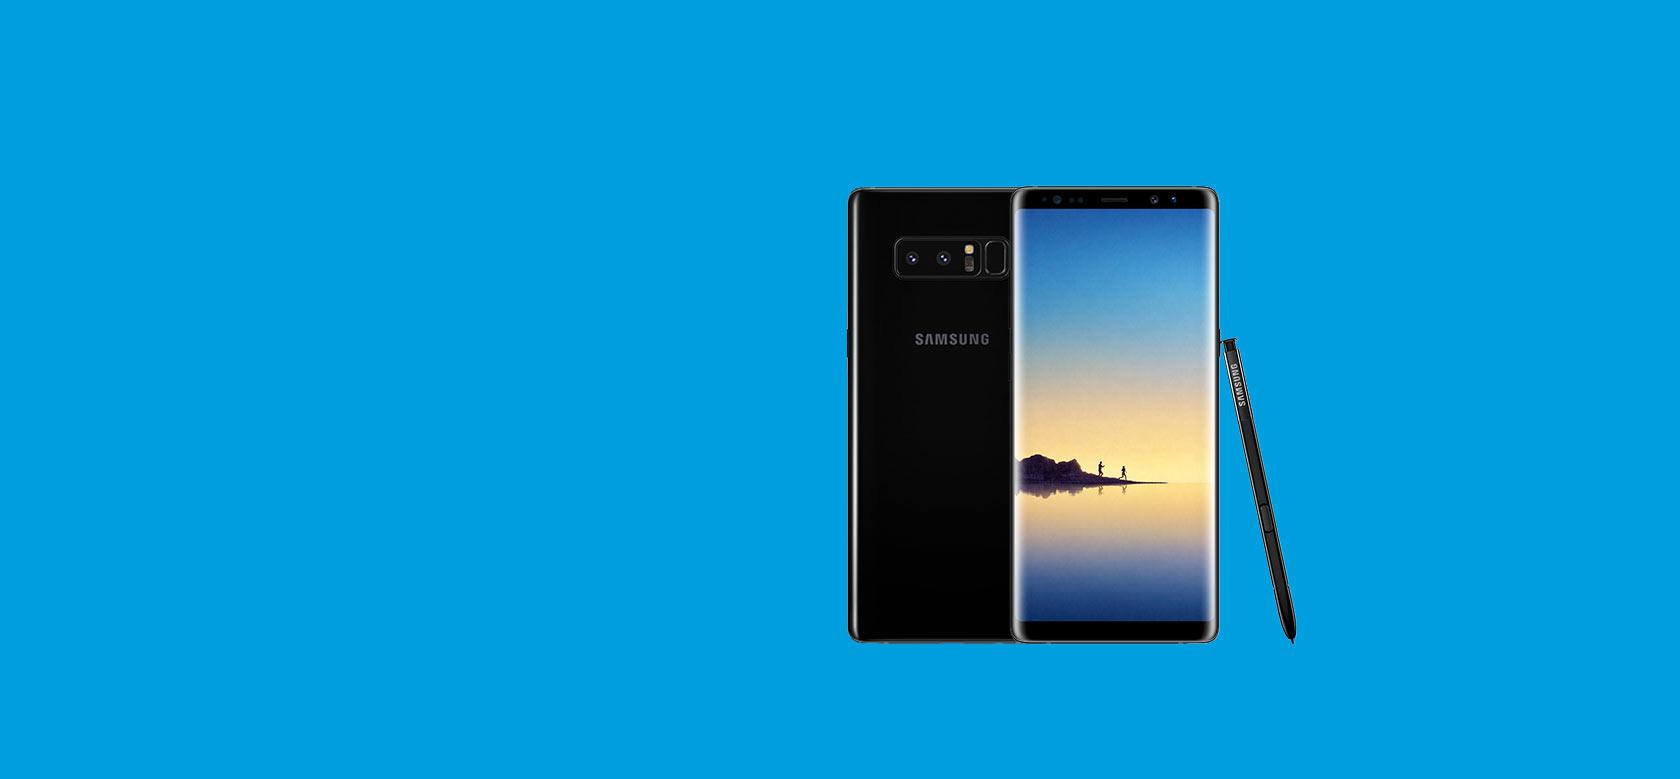 Afbeelding aanbieding [Super Deal Samsung Galaxy Note 8 64 GB]